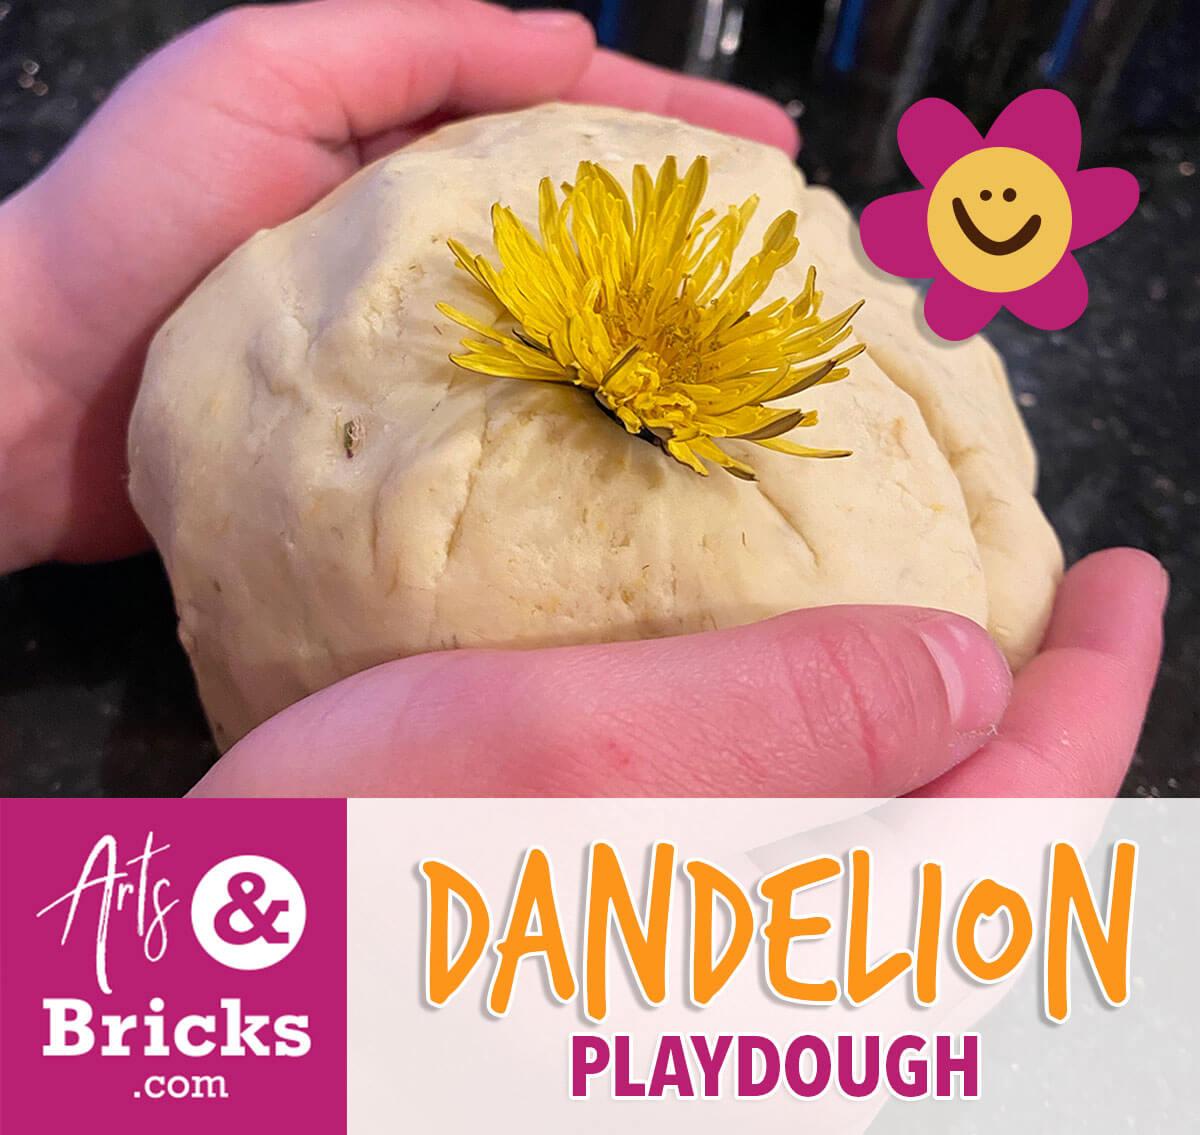 An easy recipe for Dandelion Playdough